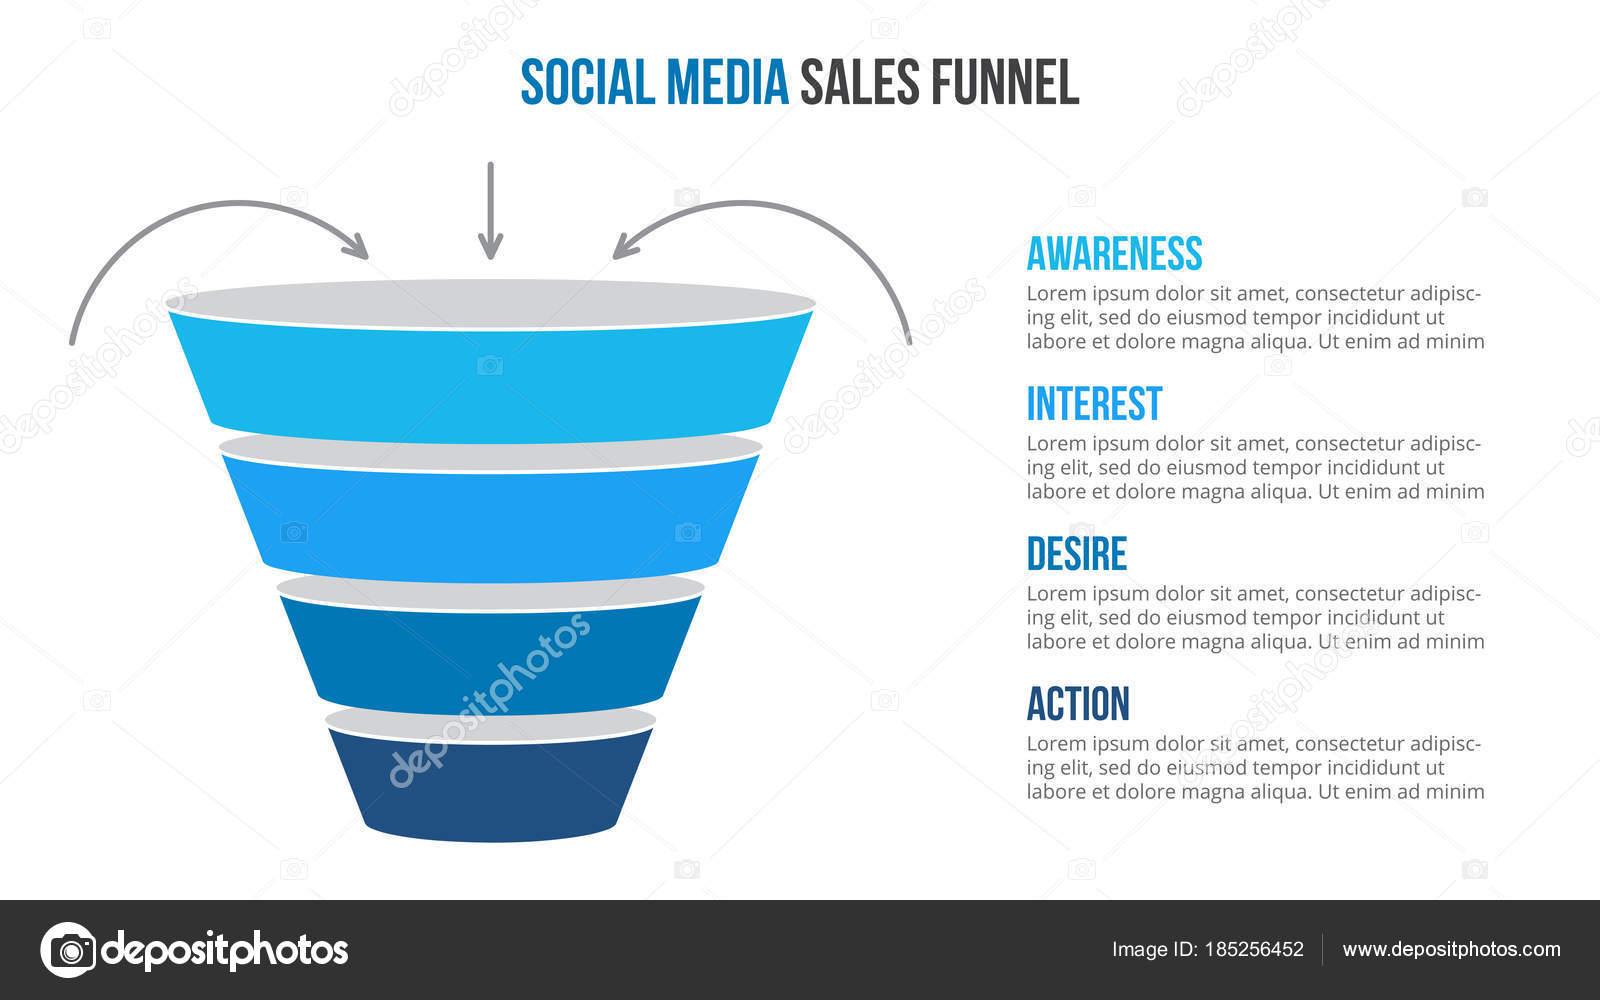 vector social media sales funnel infographic presentation template